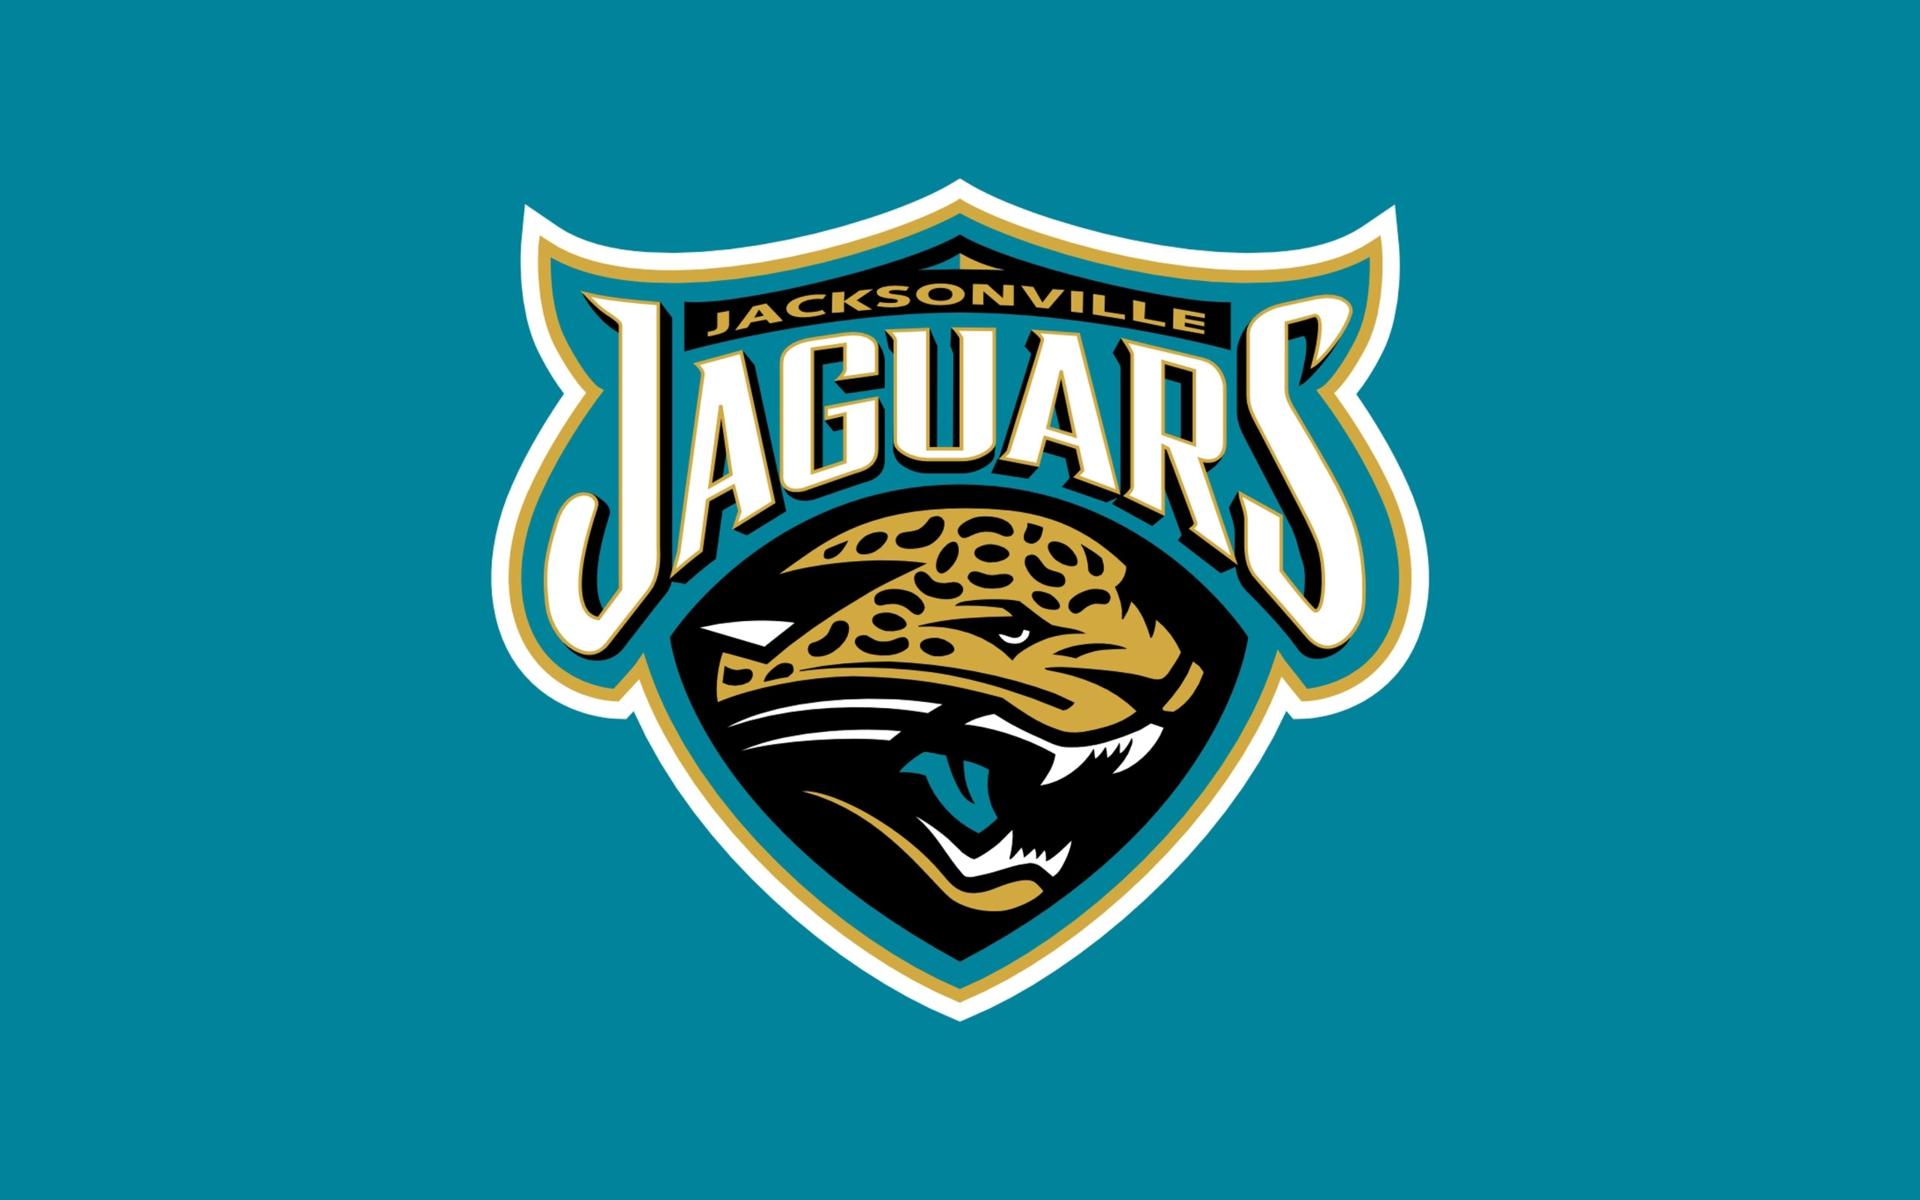 jacksonville jaguars 2017 wallpaper - photo #47